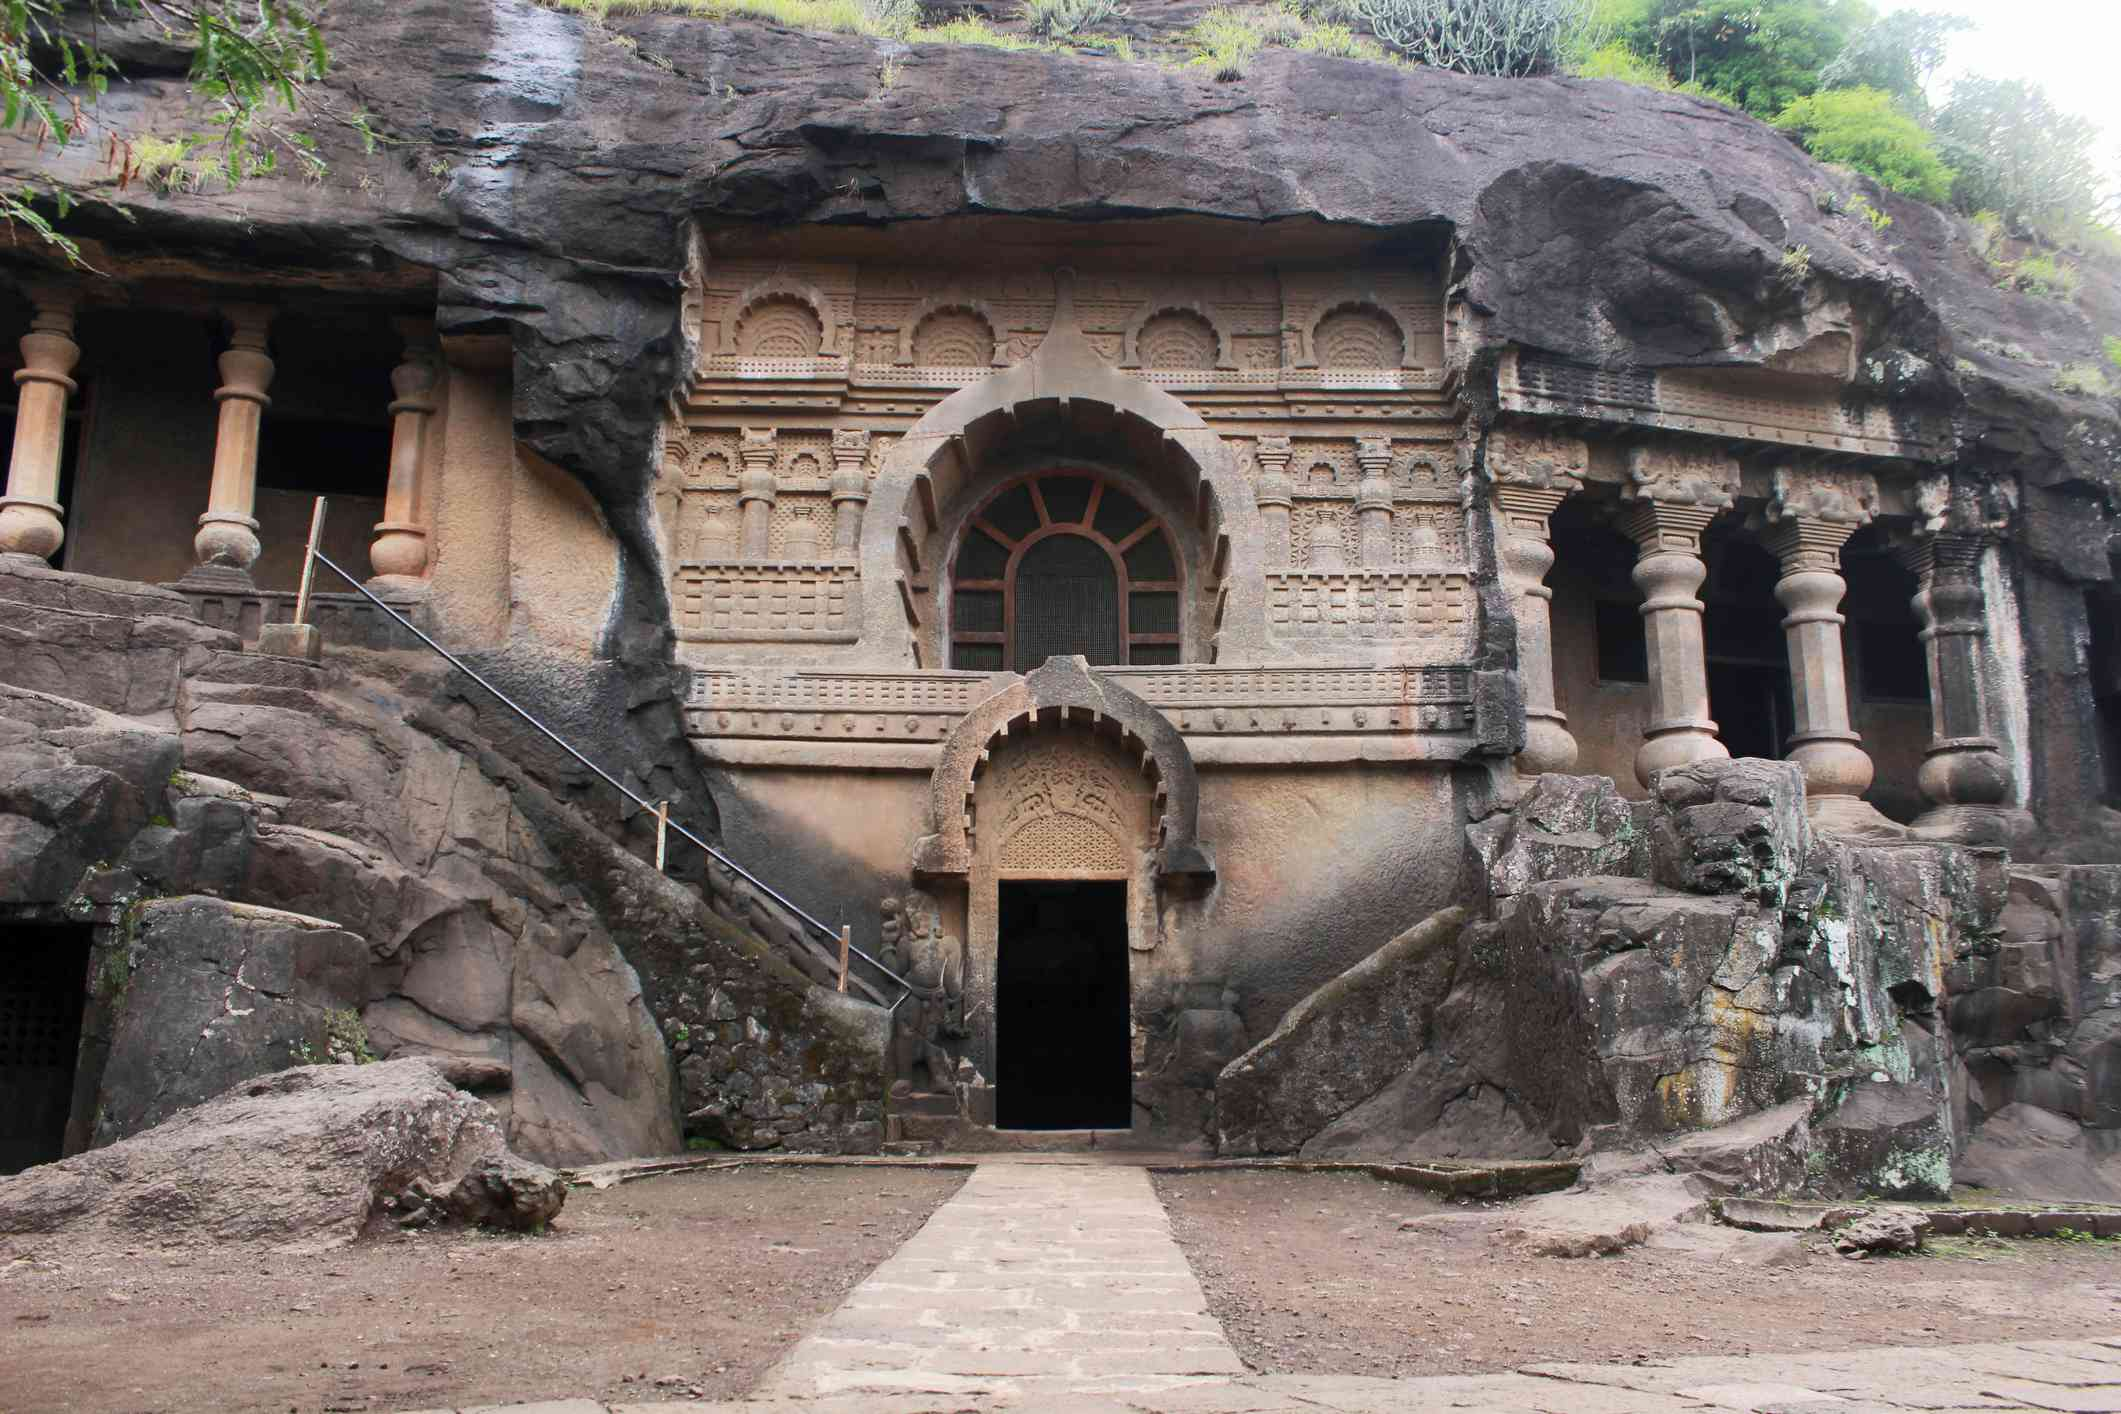 Cave 19 : Facade of Vihara of Pandavleni Cave. Nasik